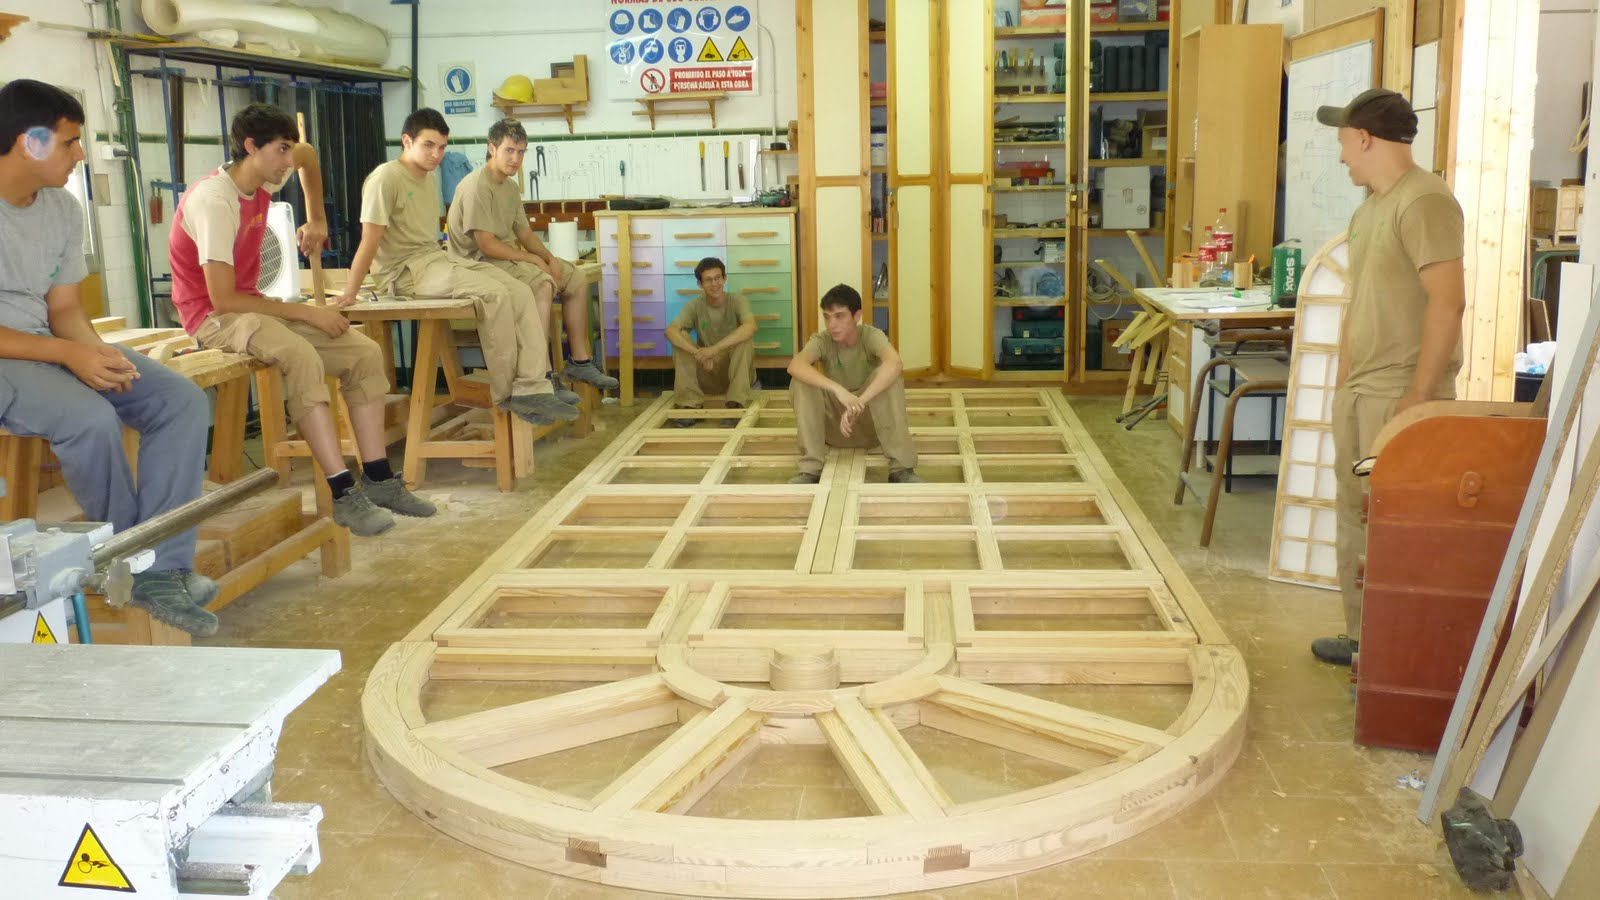 Taller carpinter a madera ventanales nave - Carpinterias de madera en madrid ...